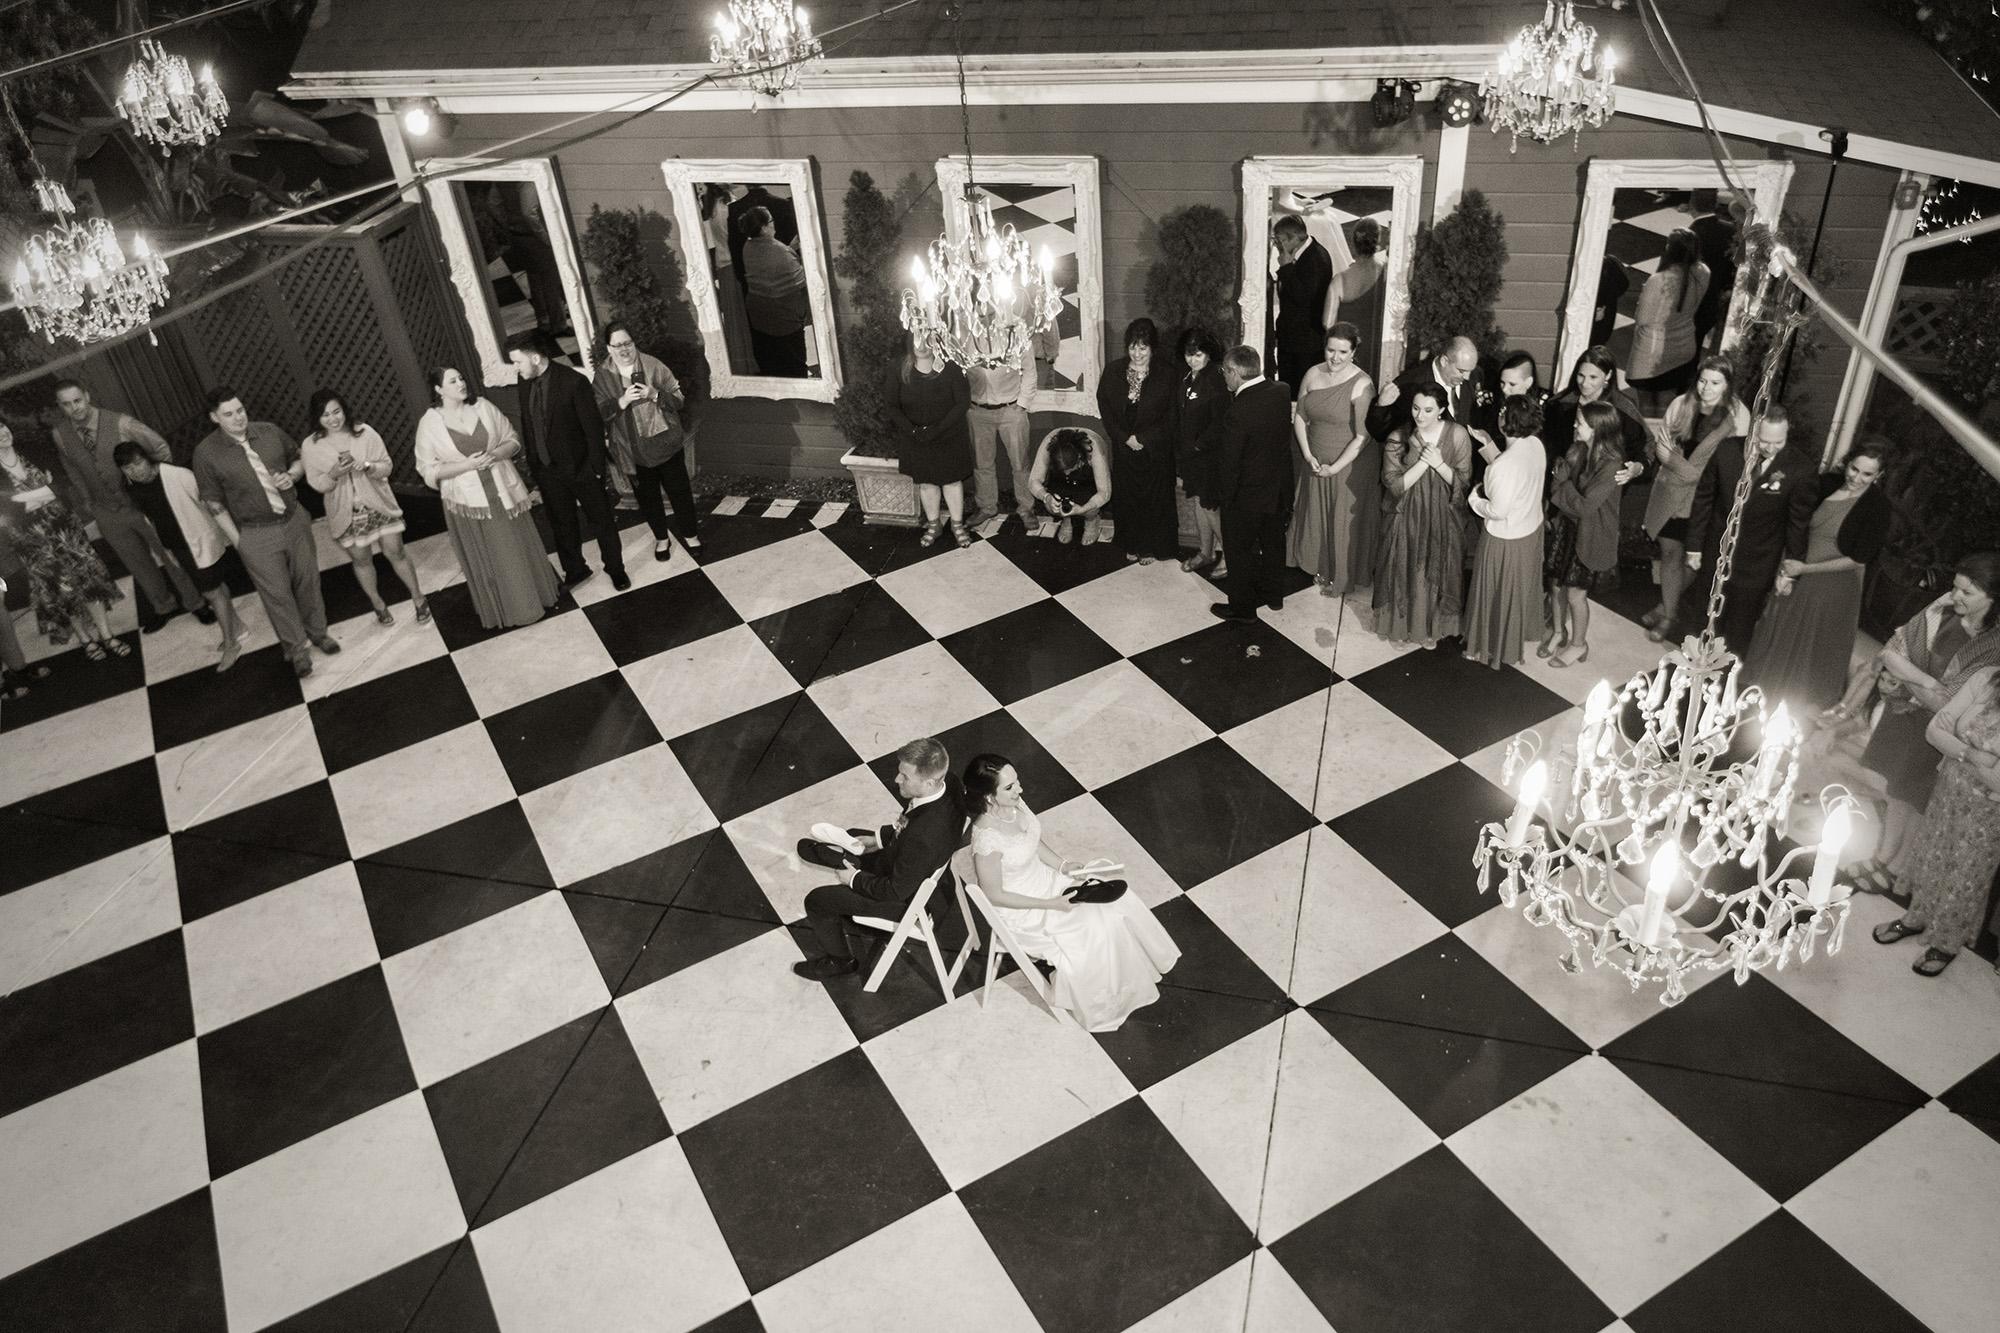 associate-photographer-christmas-house-wedding-carrie-vines-0060.jpg